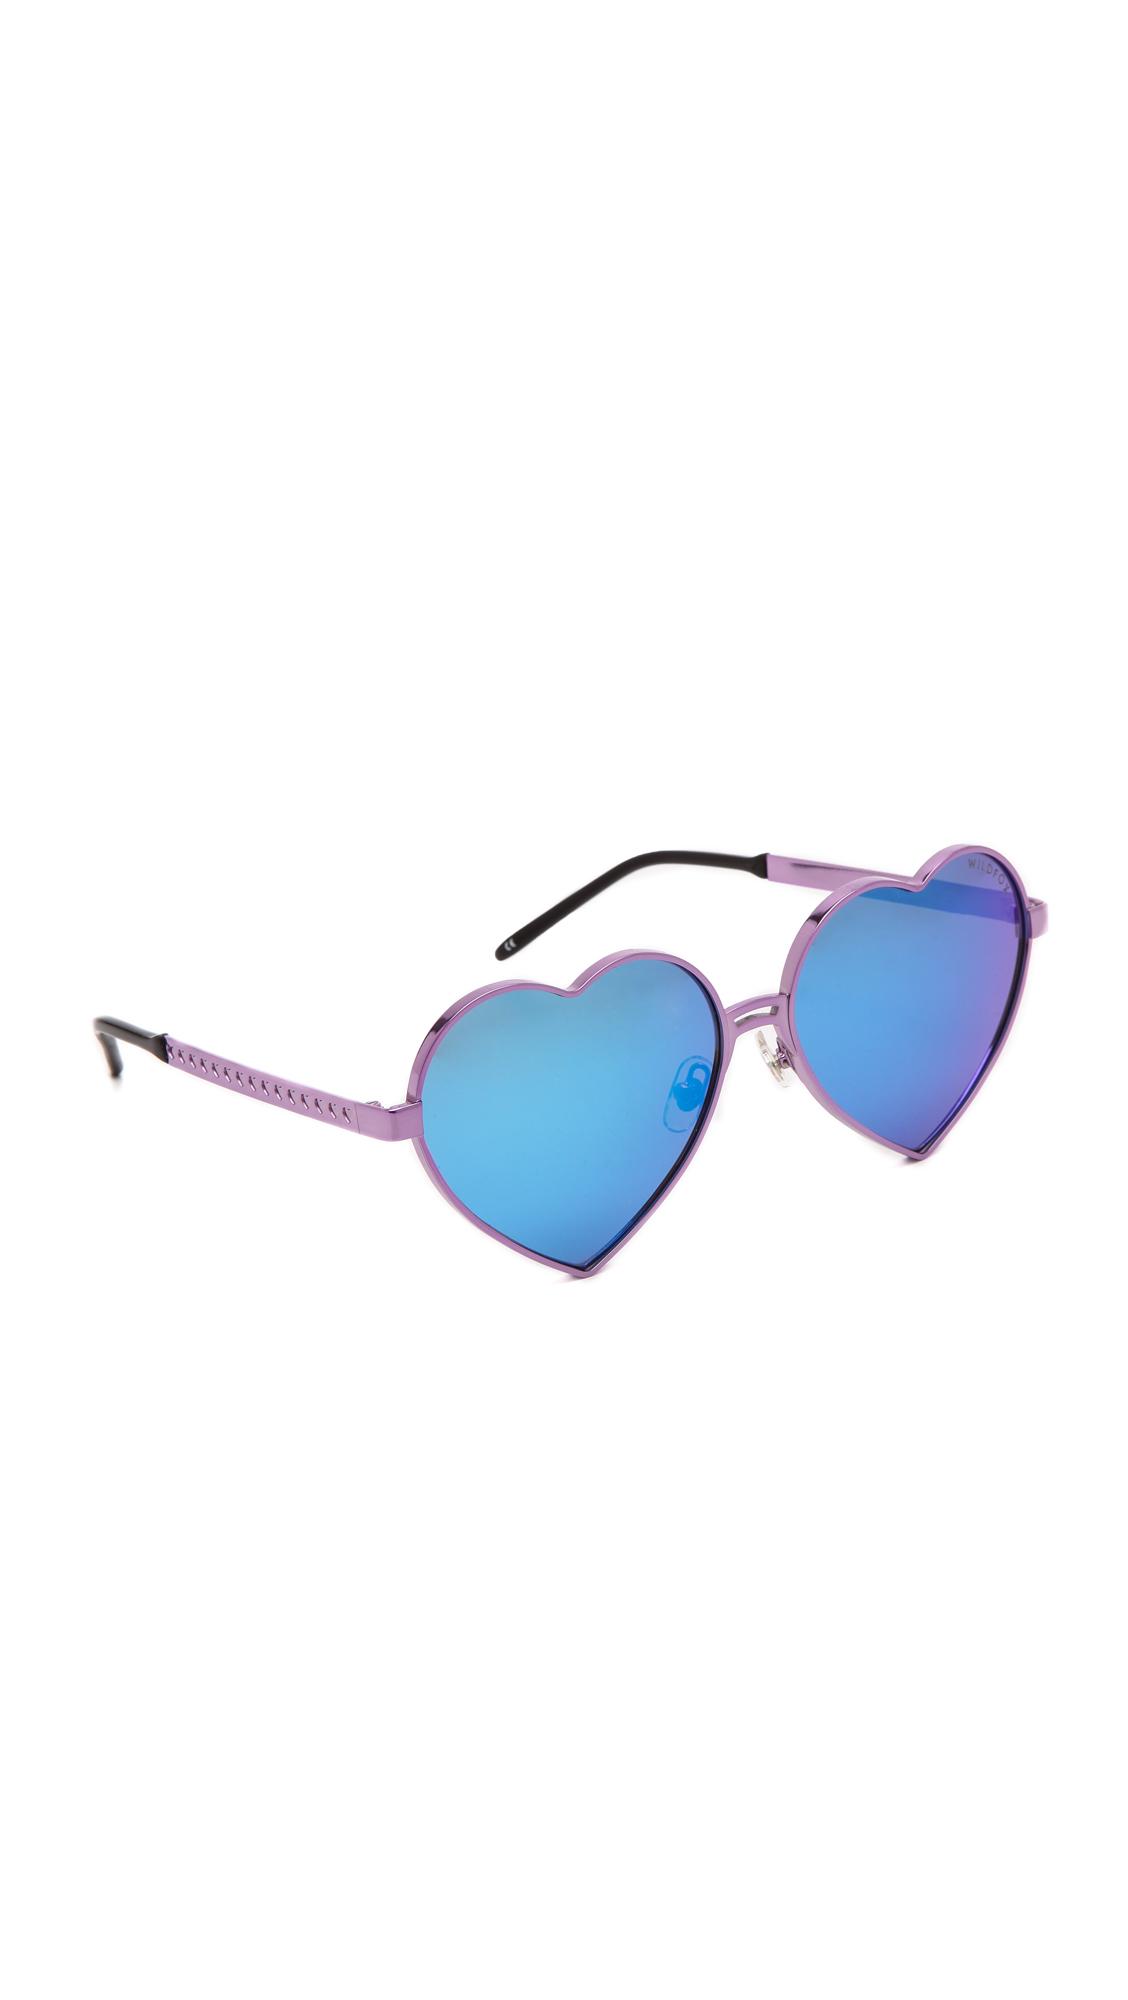 7b4d8b597f Wildfox Lolita Deluxe Sunglasses